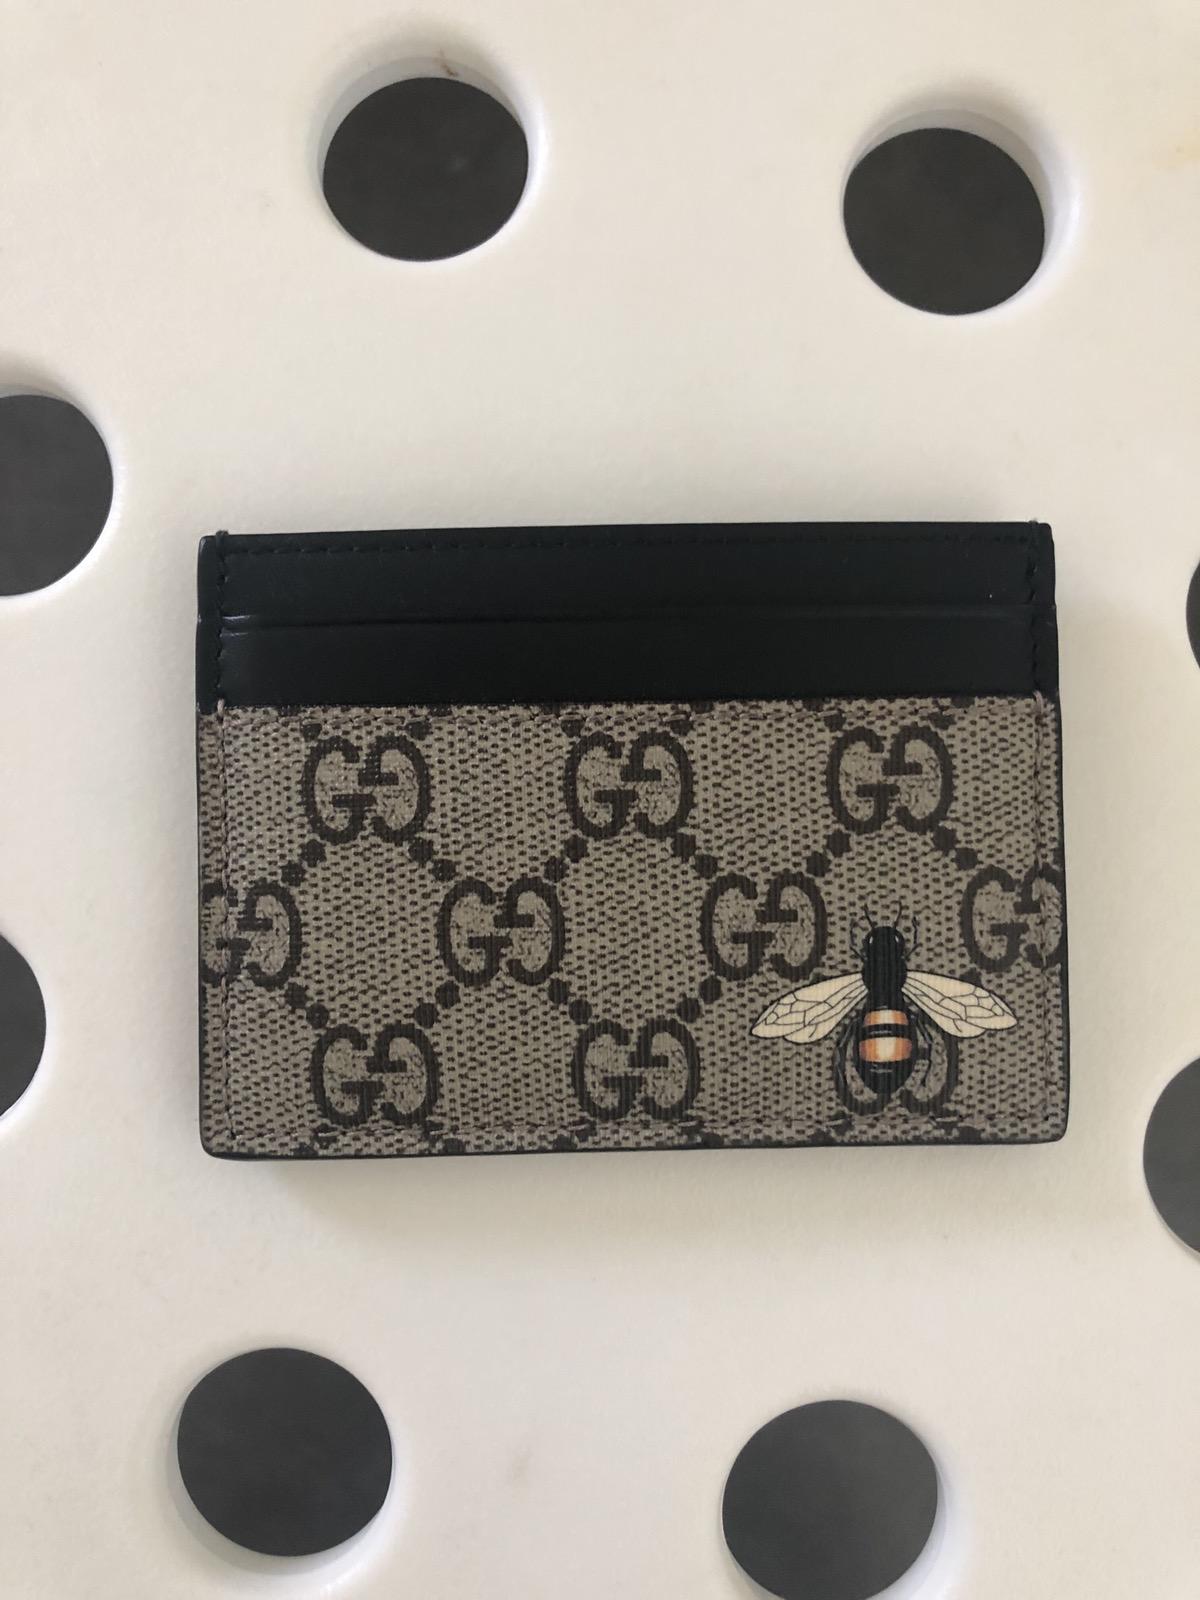 e304af7dc0c Gucci ×. Gucci Card Case Bee print GG Supreme. Size  ONE SIZE